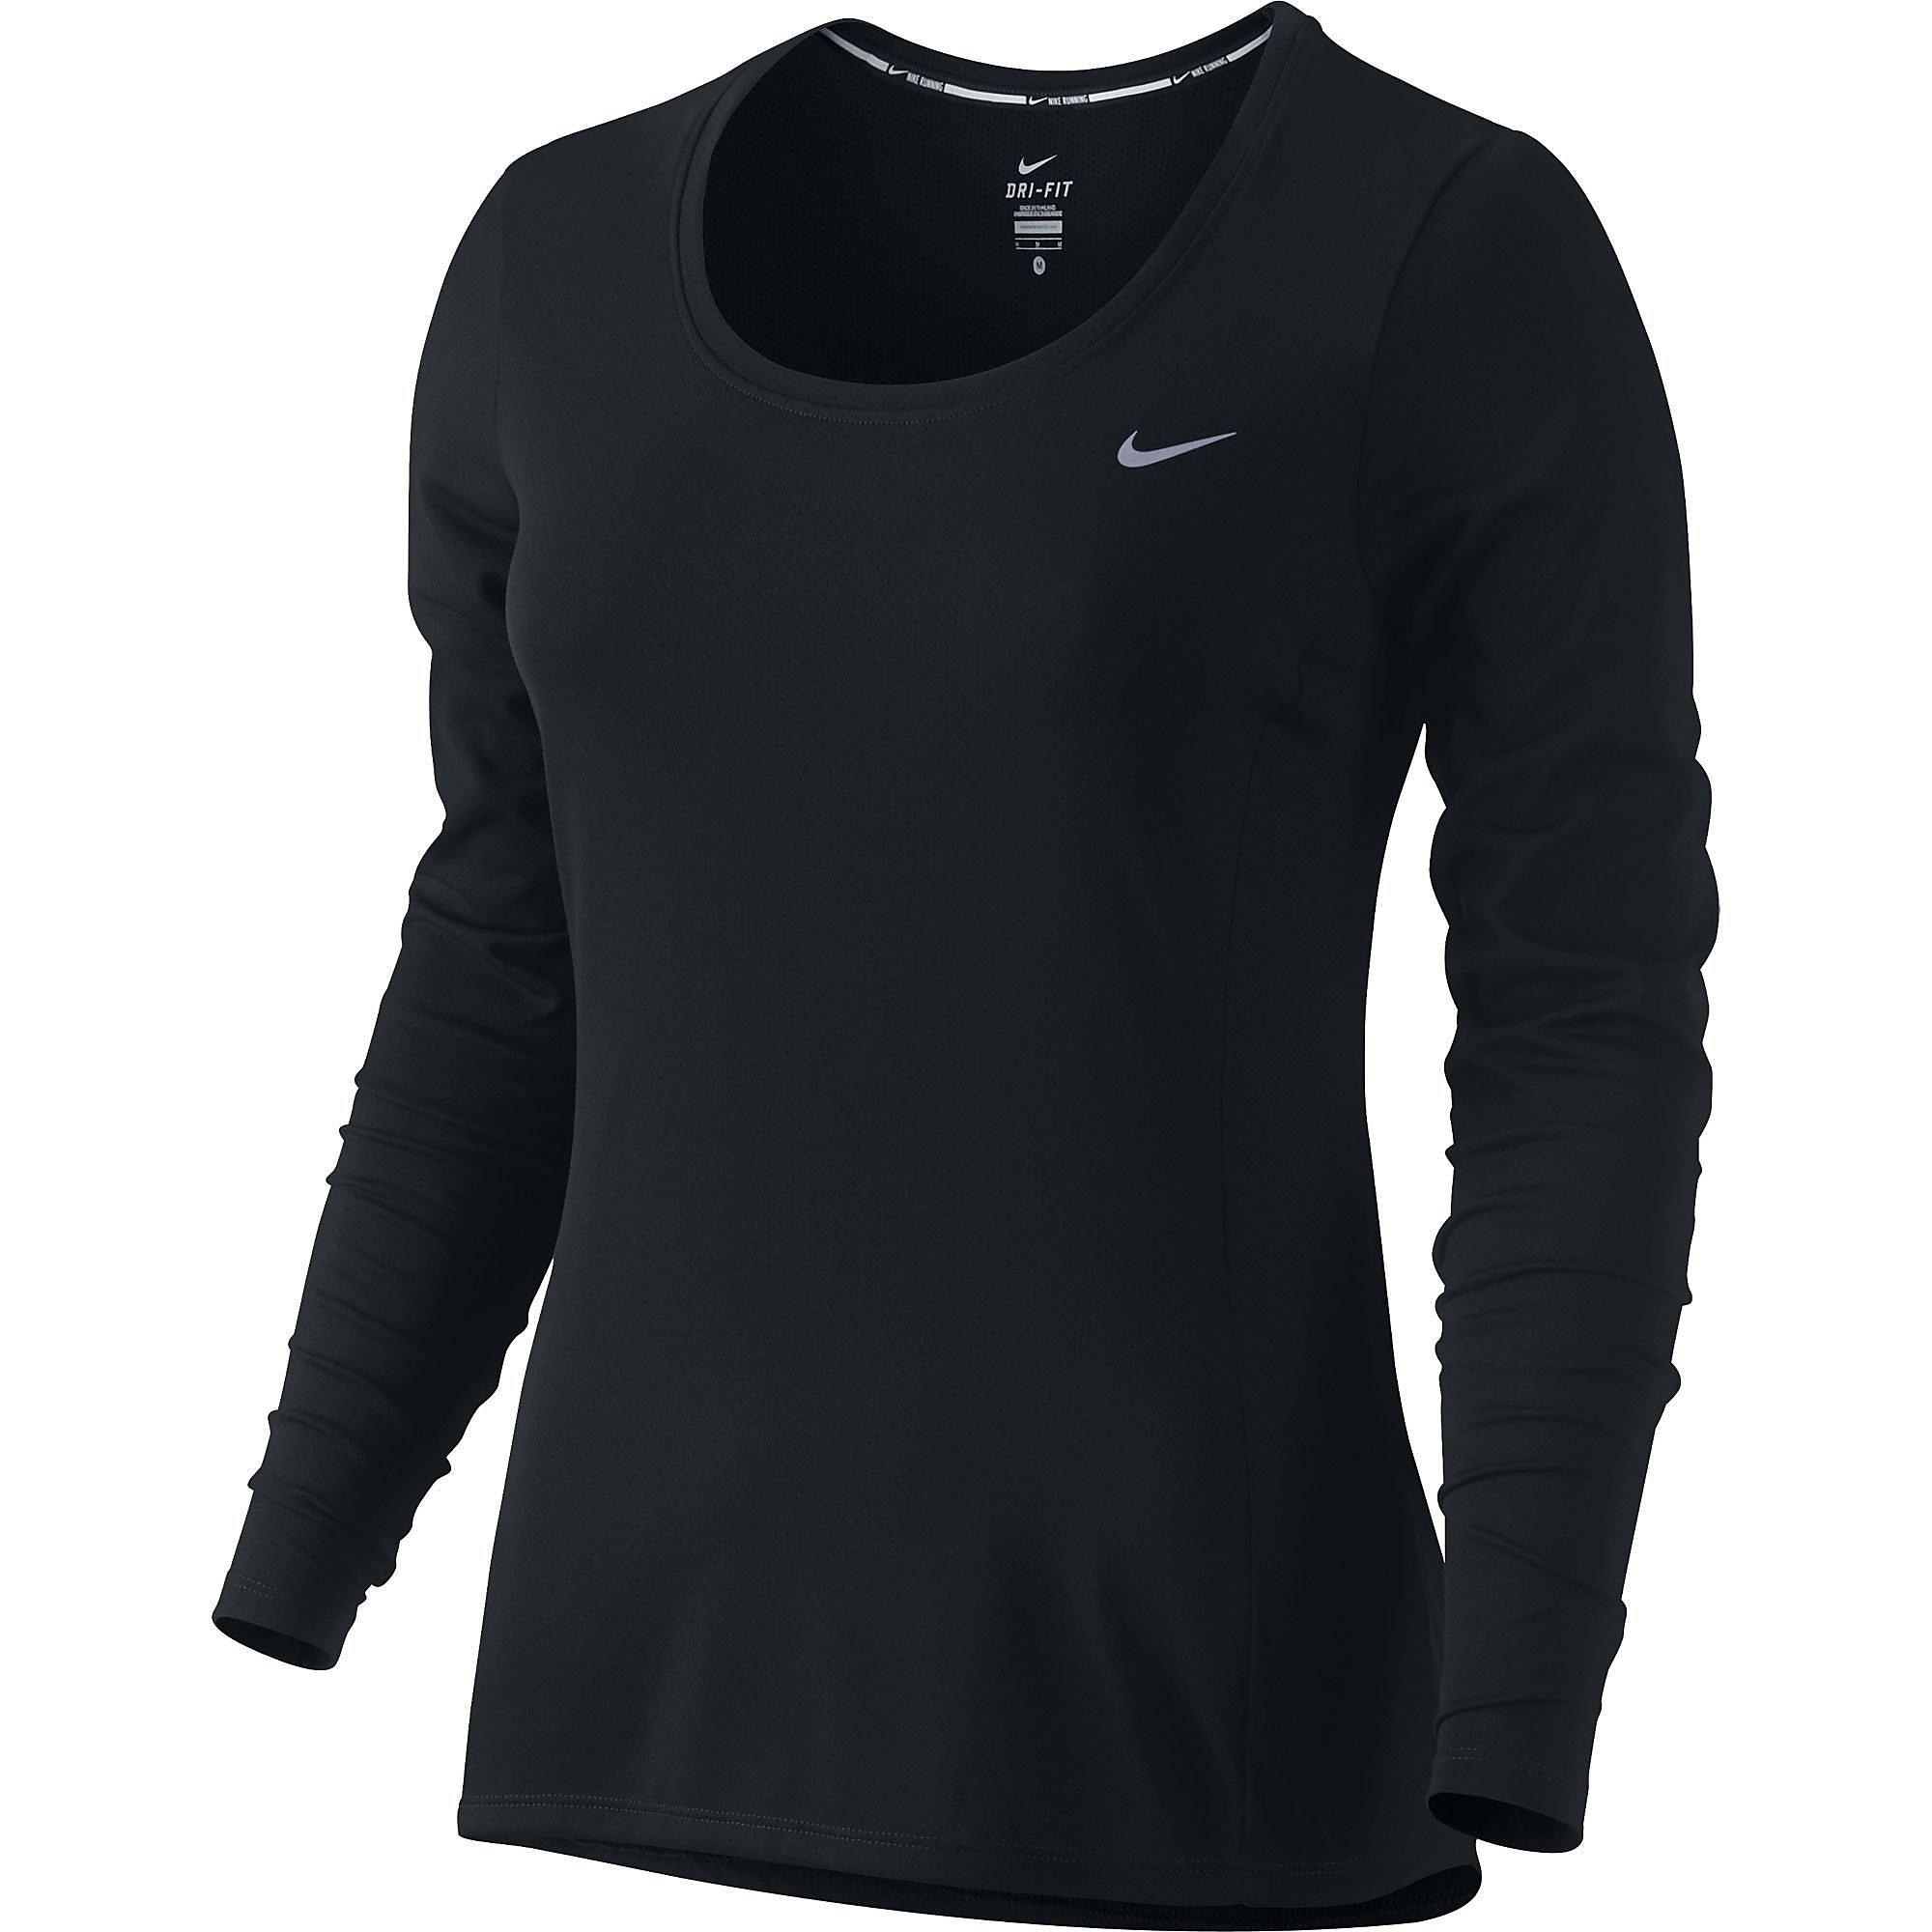 Nike DRI-FIT CONTOUR LONG SLEE